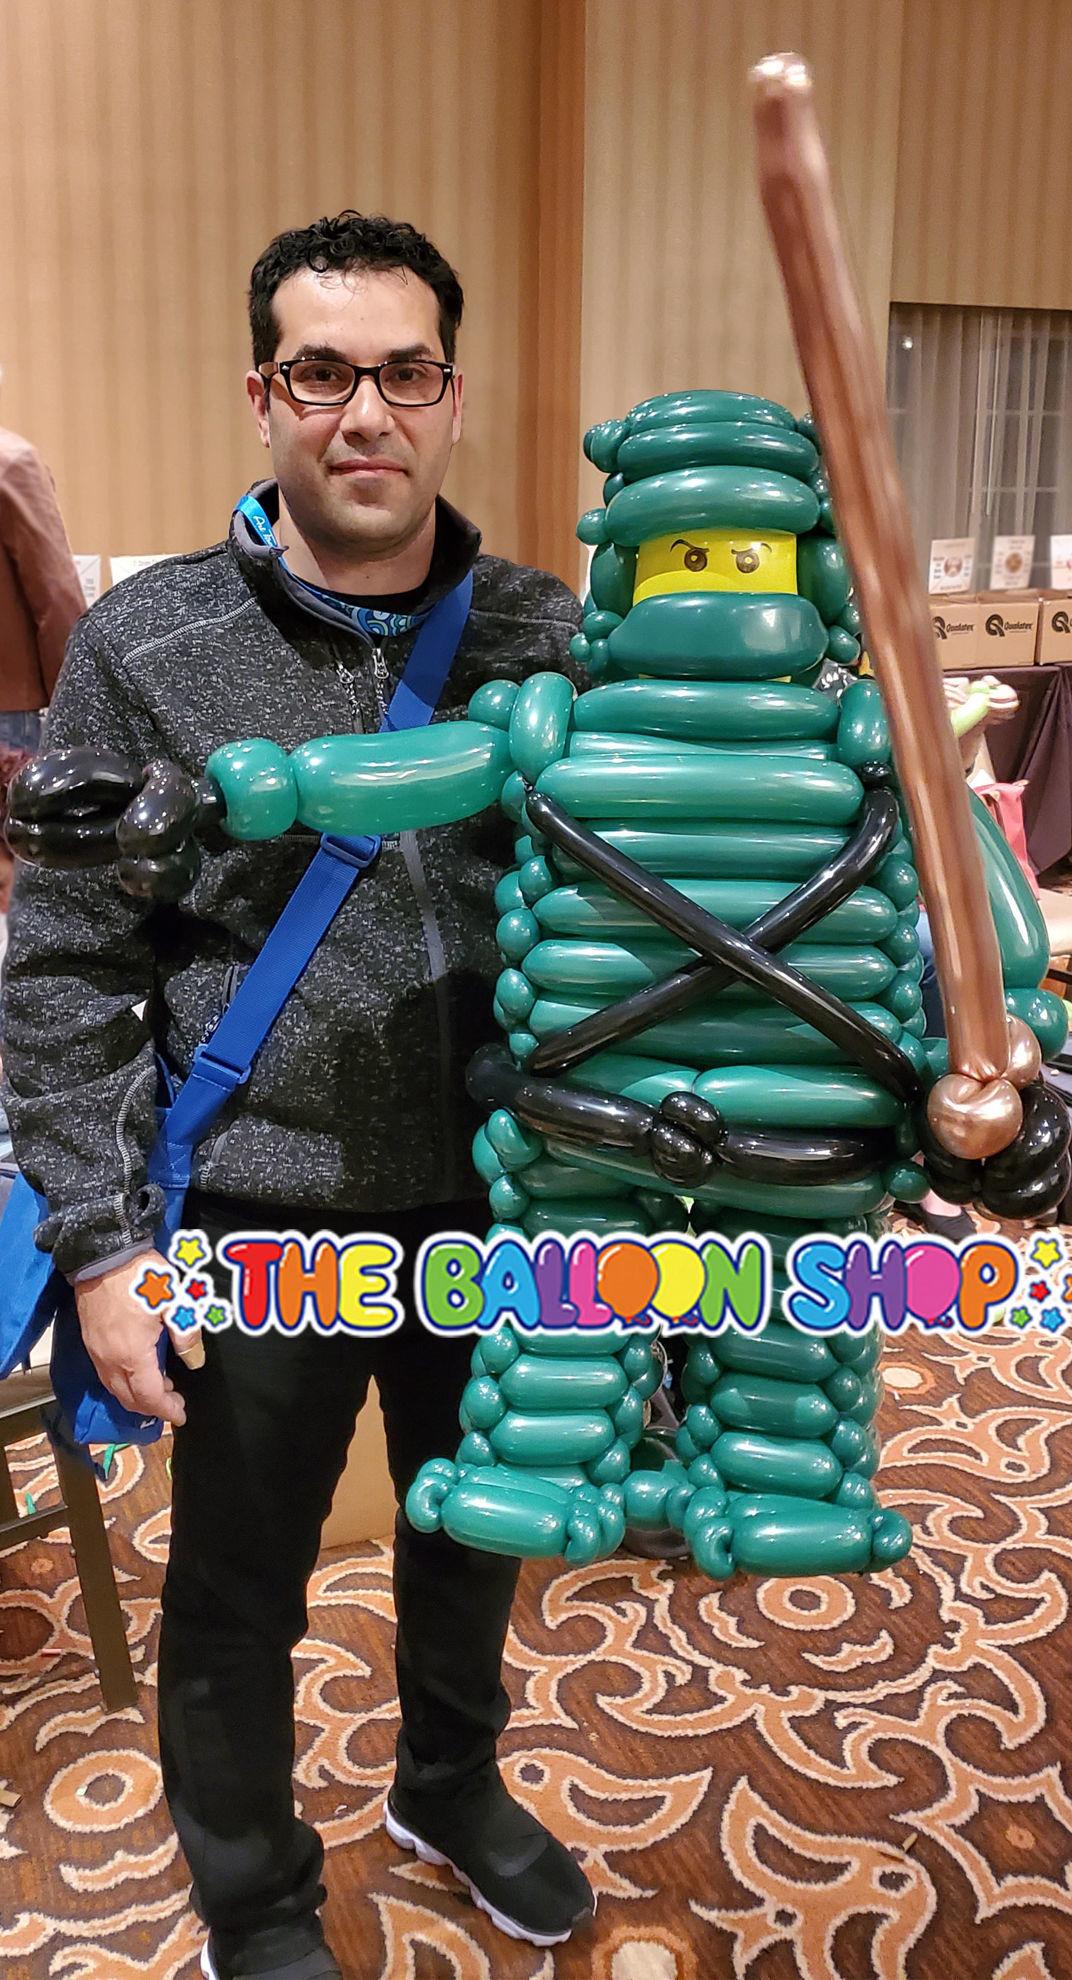 Picture of Lego Ninja Character - Balloon Centerpiece